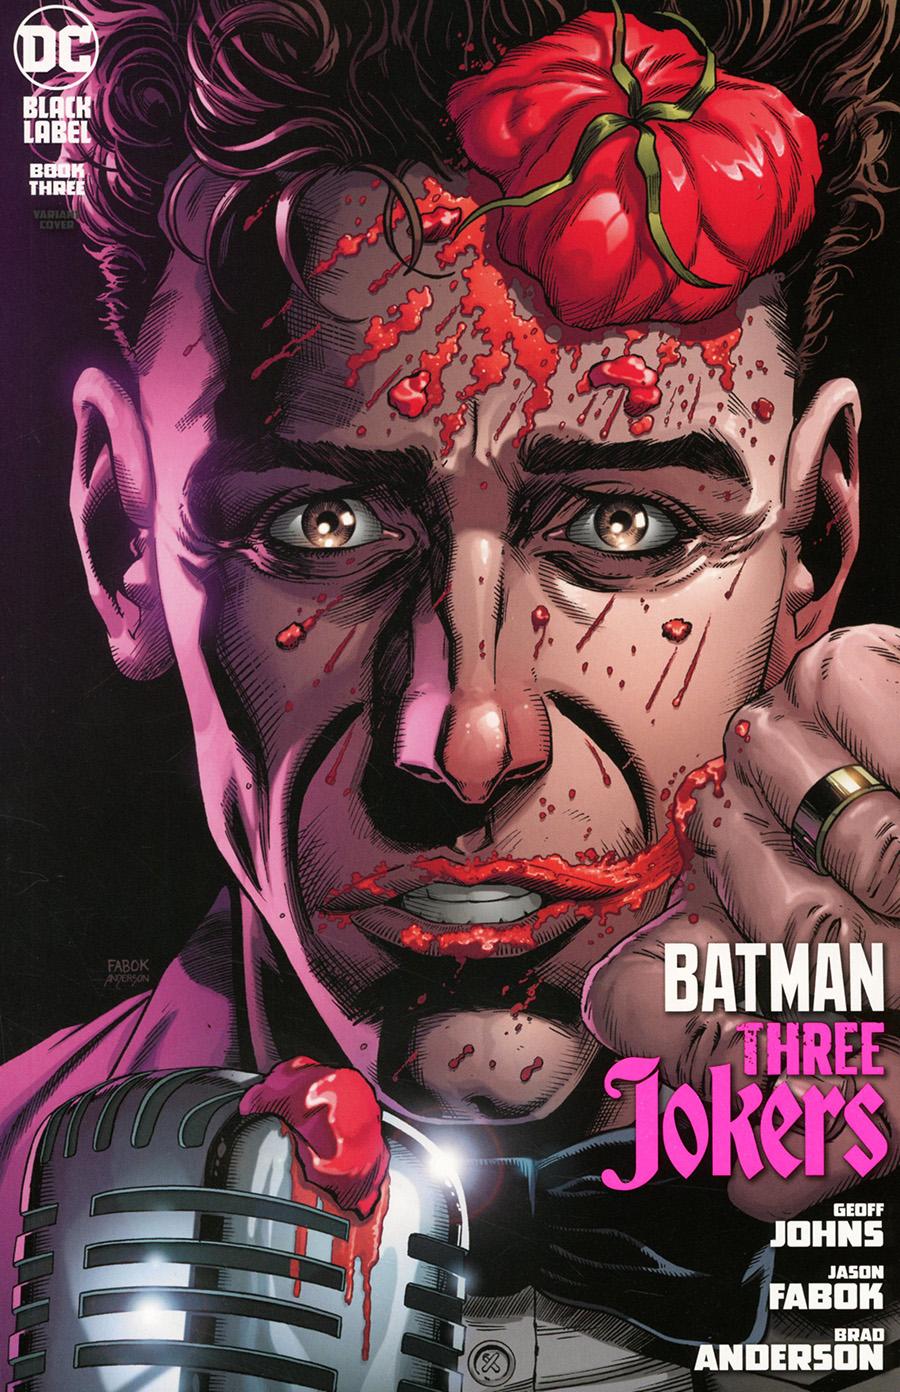 Batman Three Jokers #3 Premium Variant H Jason Fabok Stand-Up Comedian Cover